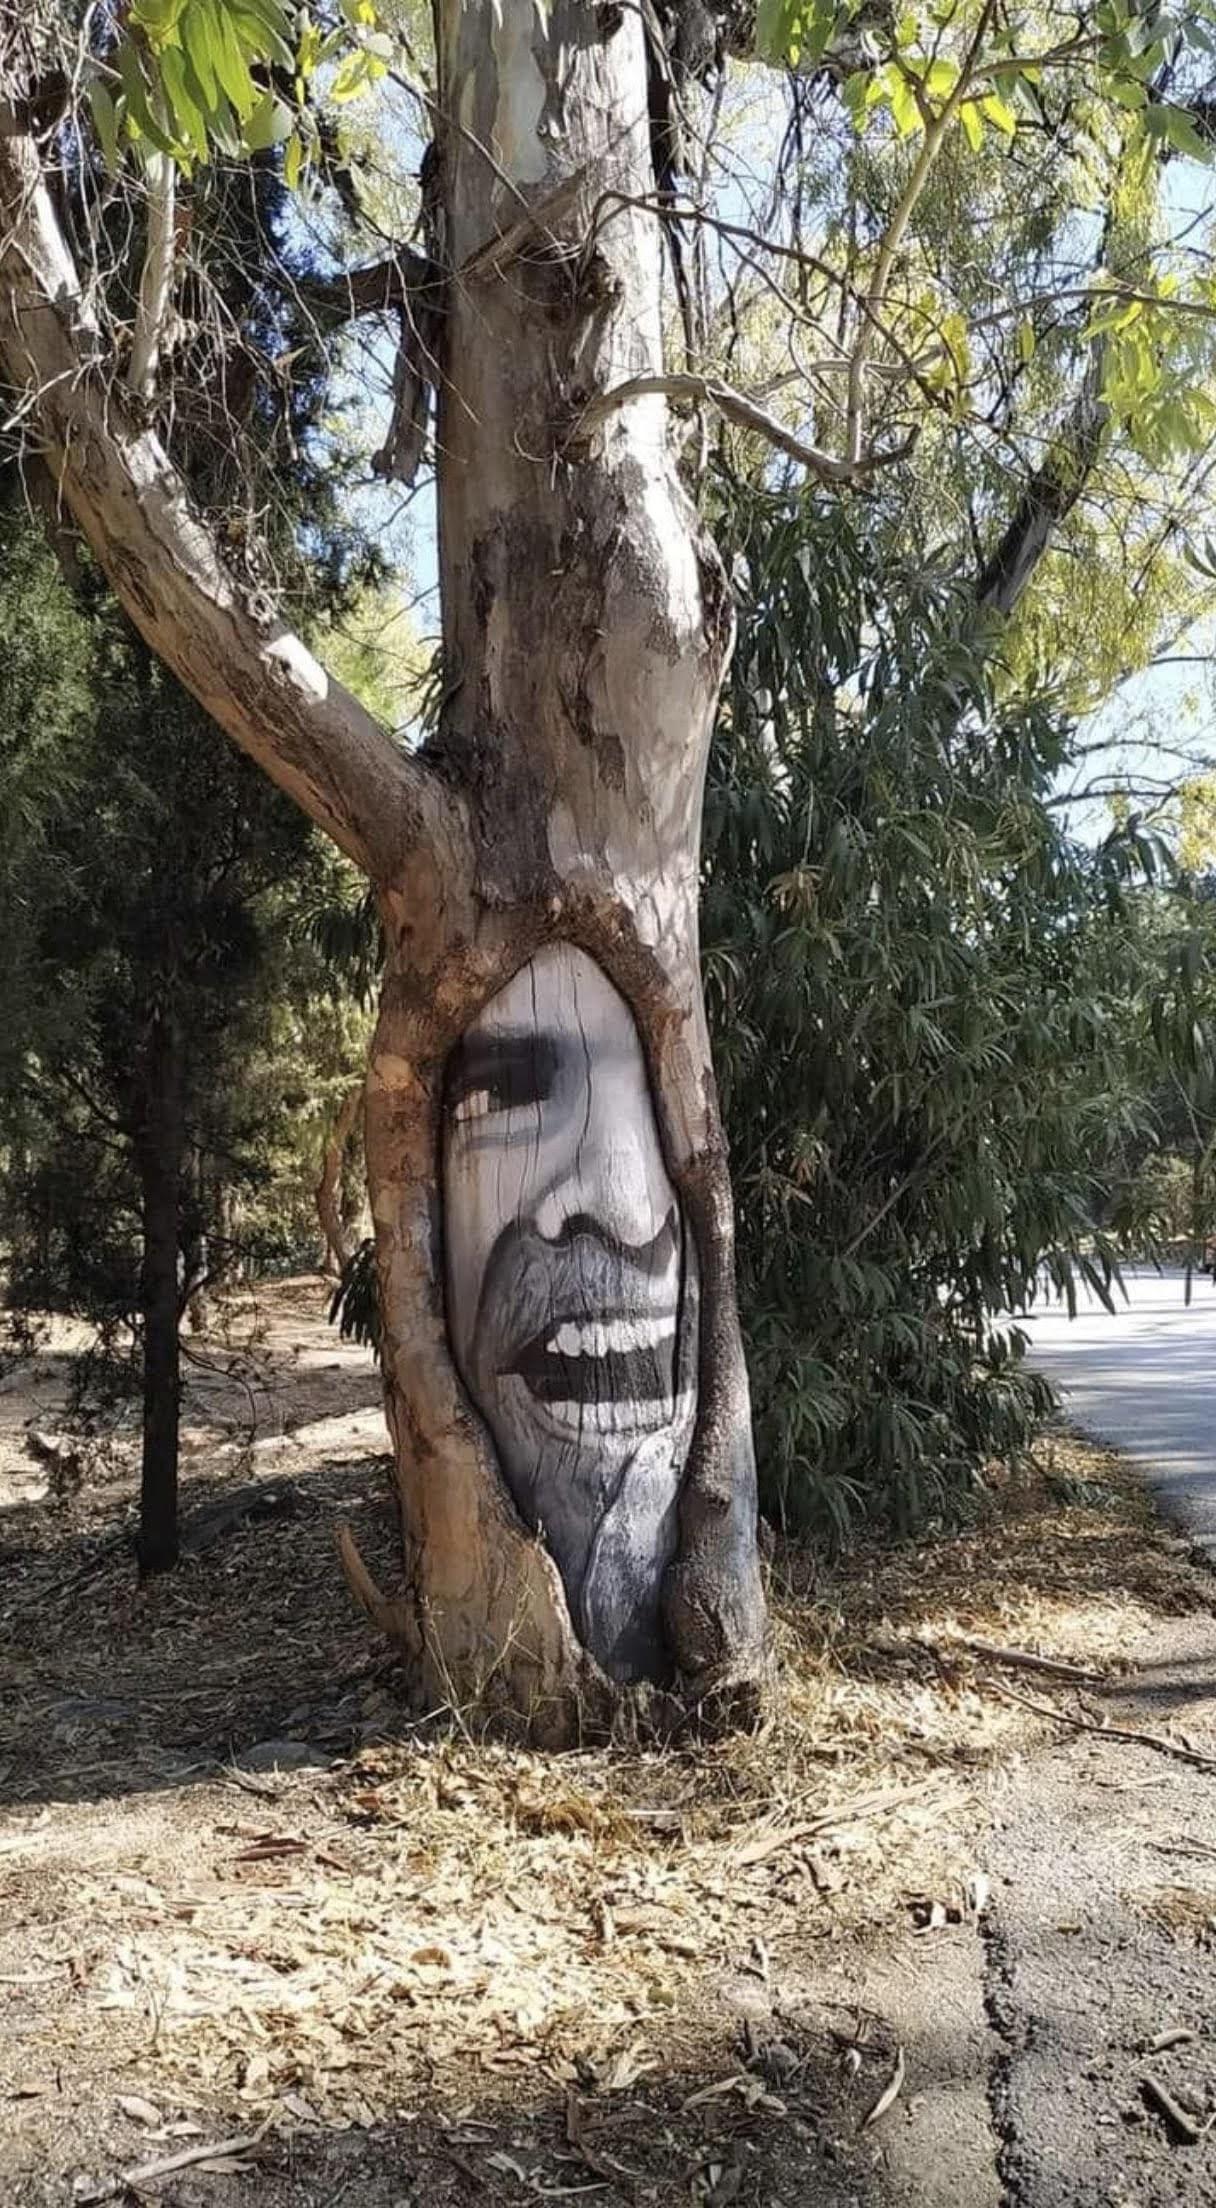 The Shining Tree : 故スタンリー・キューブリック監督のホラー映画史上の傑作「ザ・シャイニング」のジャック・ニコルソンの名シーンを再現した樹木のストリート・アート‼️